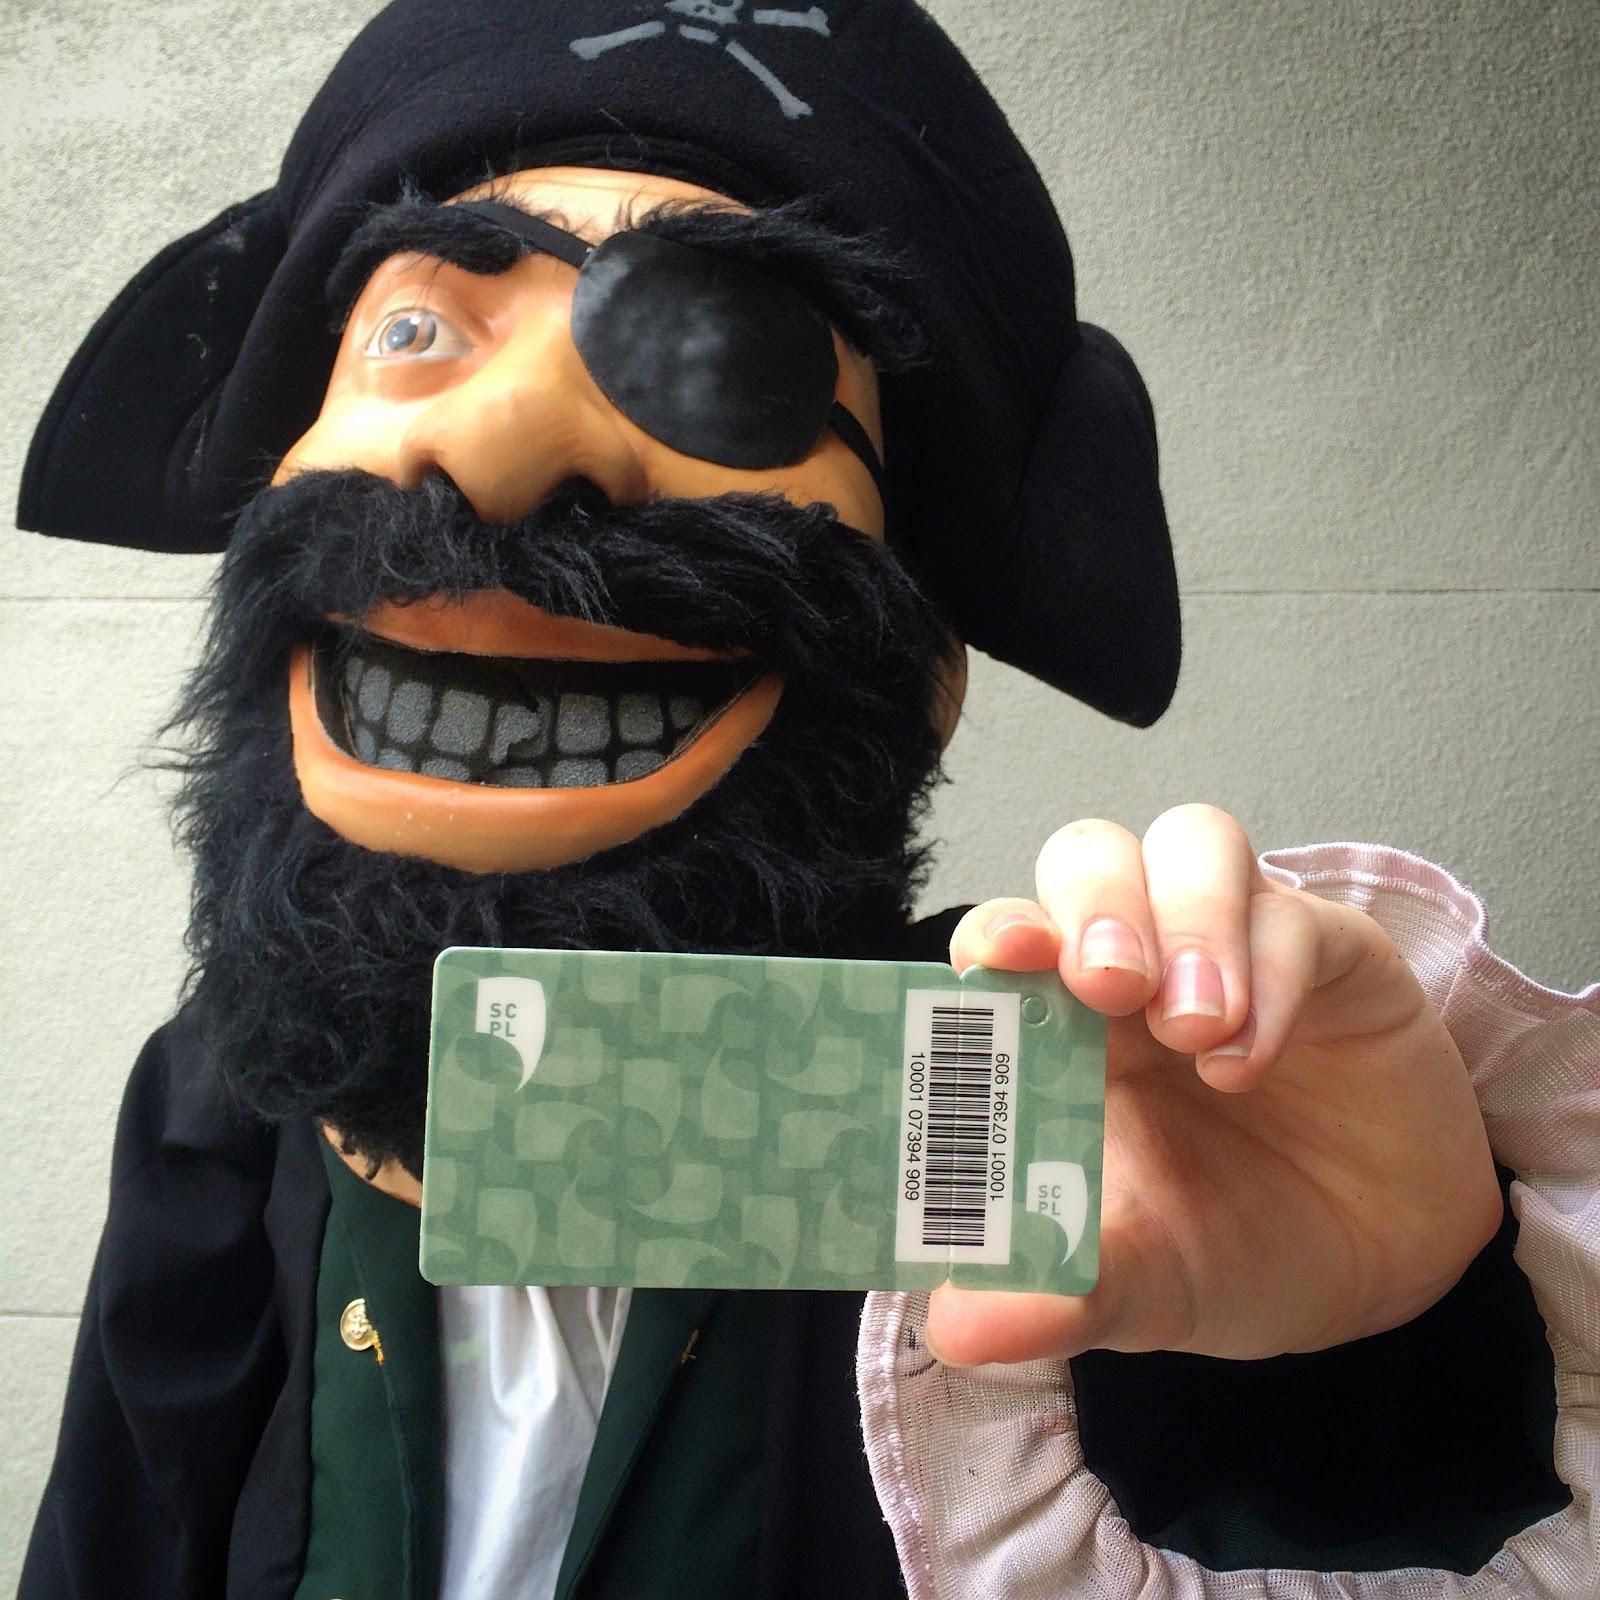 scpl-pirate_IMG_1437.jpg